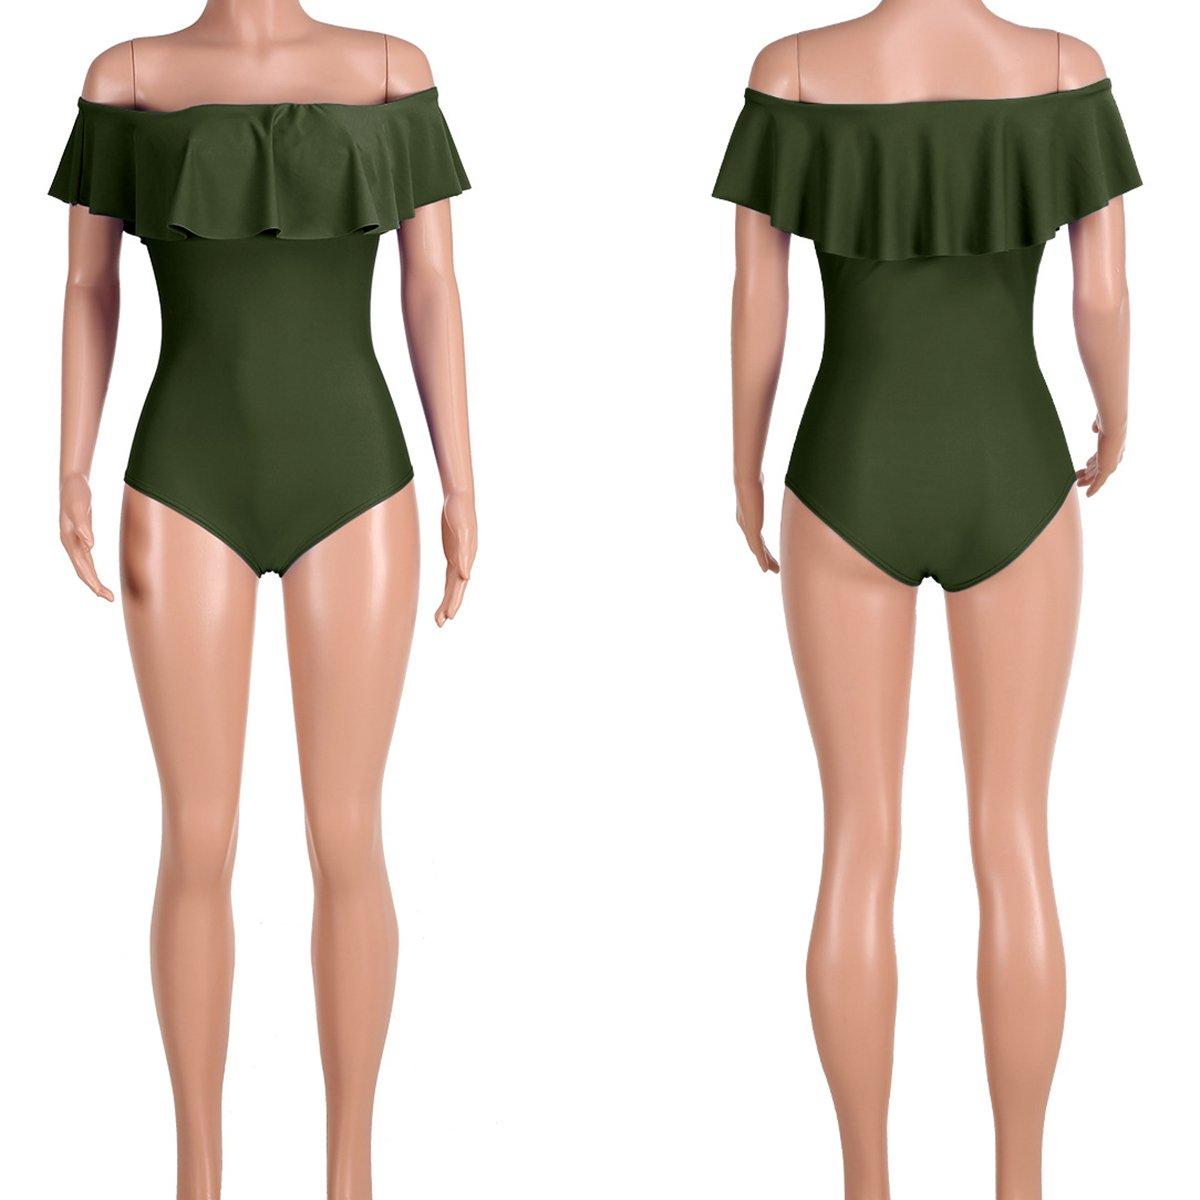 ec8025857617 Subtle Flavor Women's Sexy Off Shoulder Ruffle One-Piece Swimsuit Monokini  Bikini Bathing Suit at Amazon Women's Clothing store: